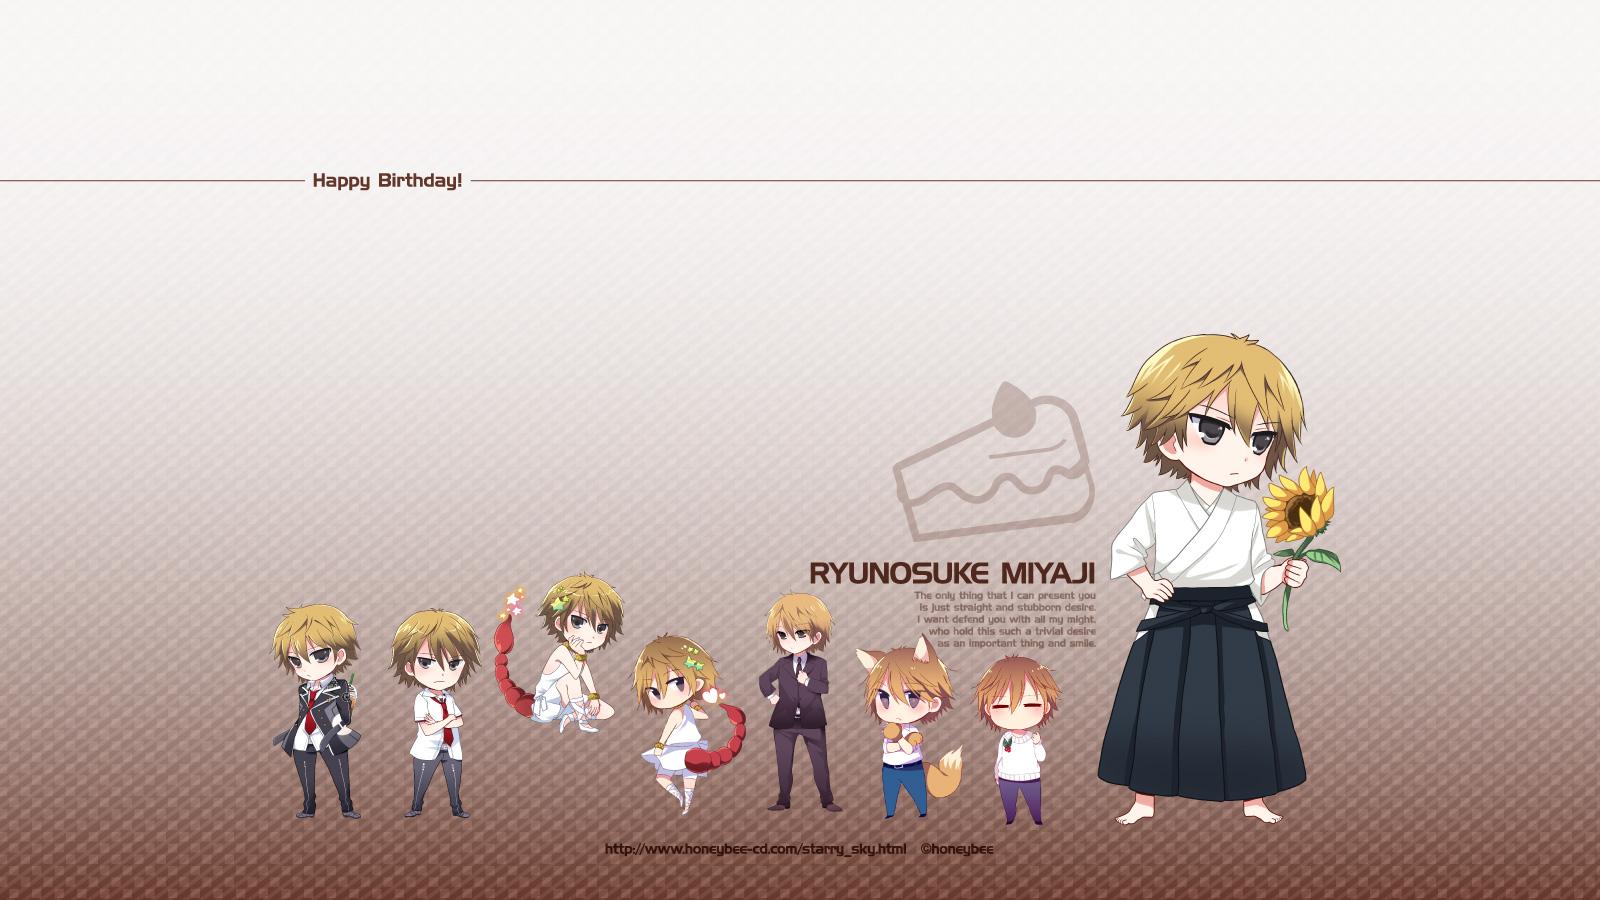 Ryunosuke Miyaji Kun  Facebook